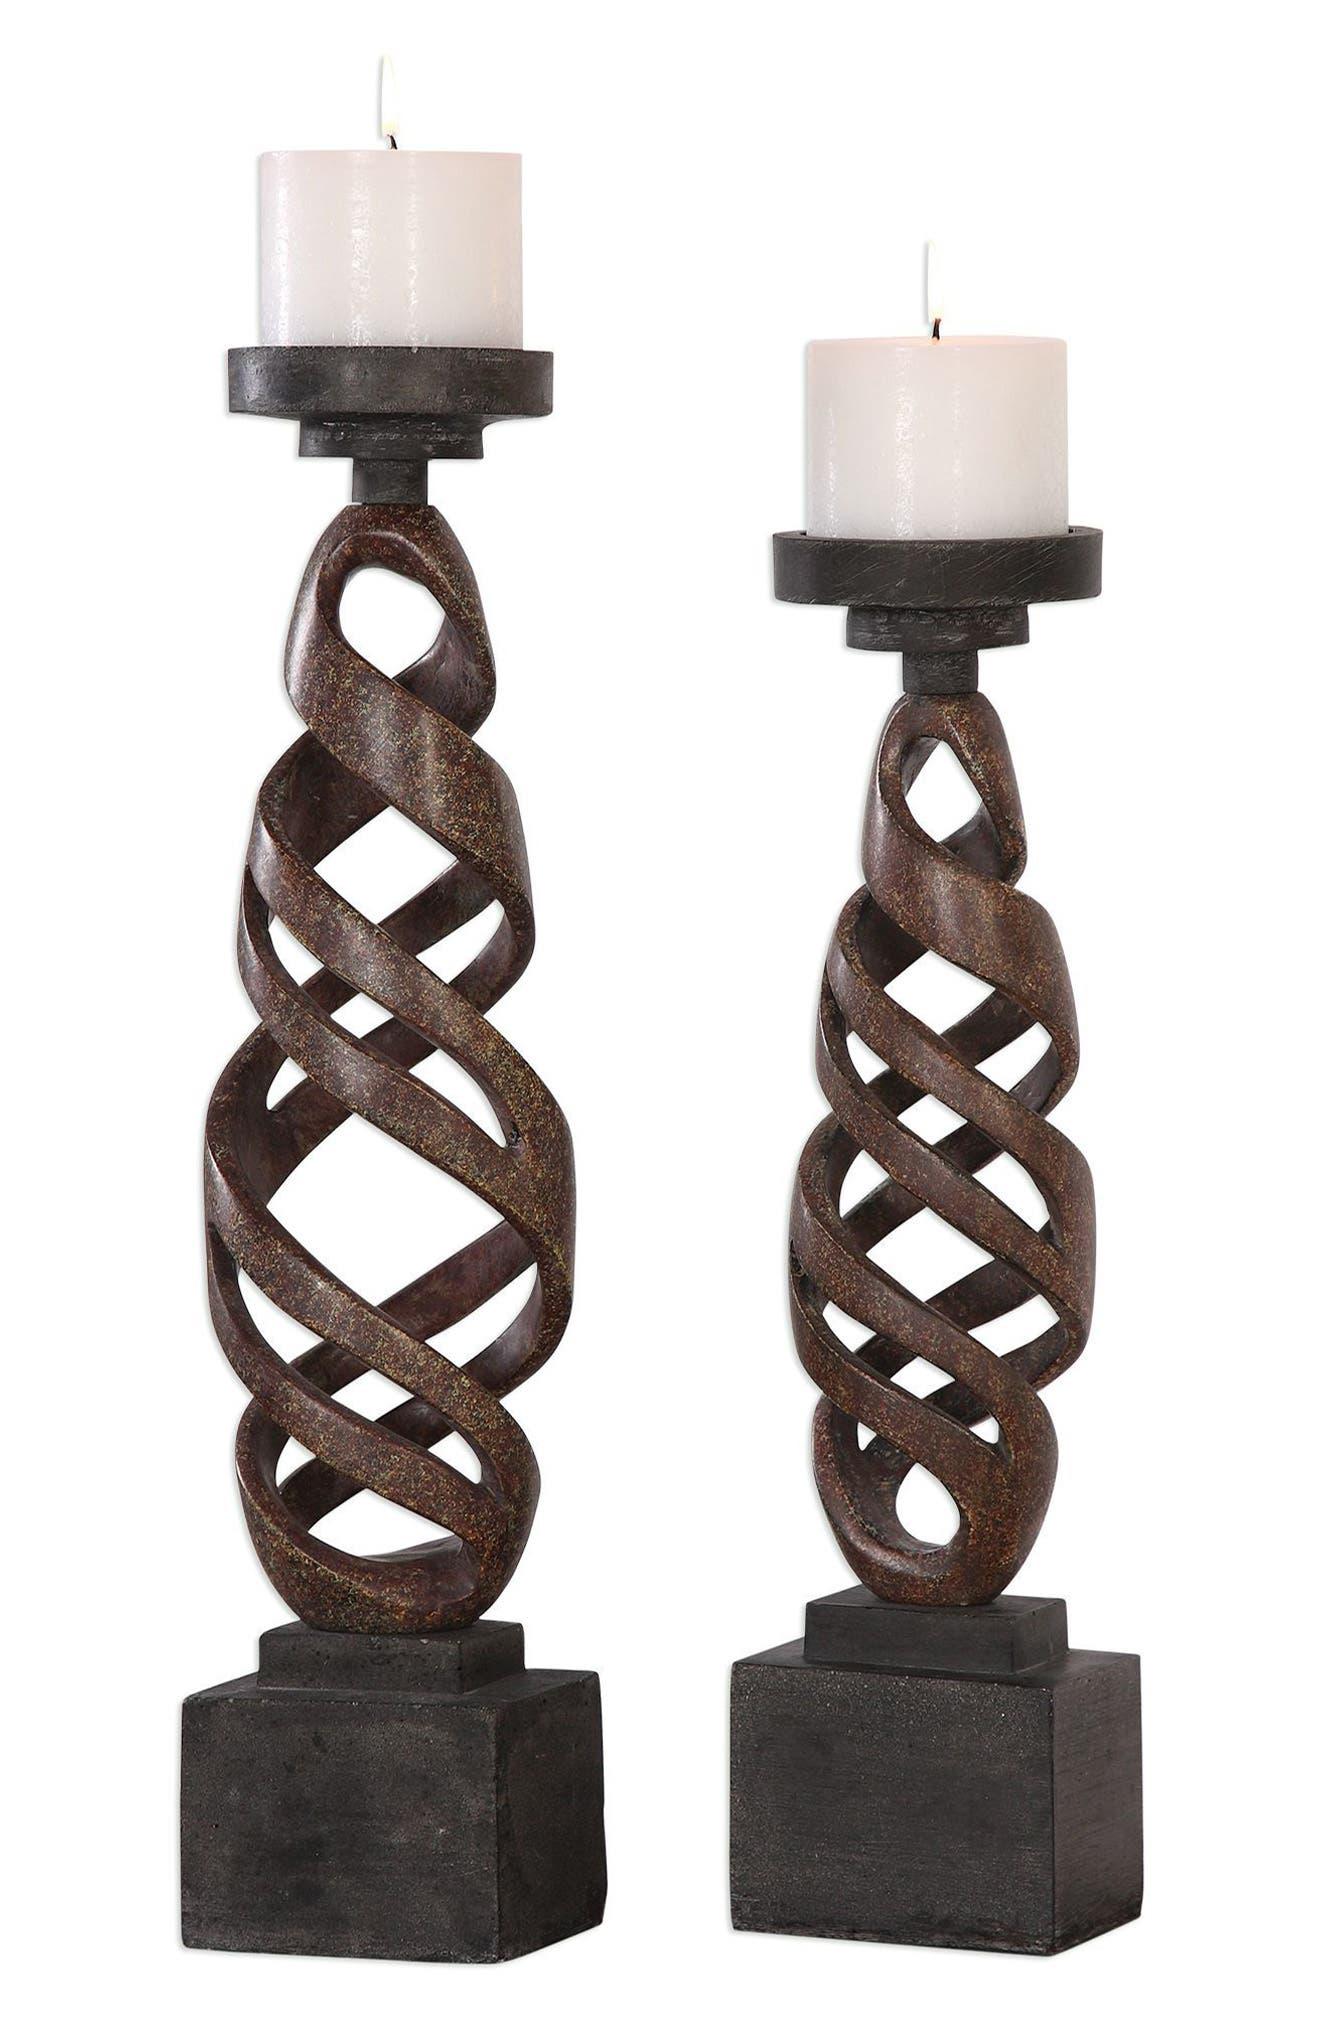 Main Image - Uttermost Abrose Set of 2 Candleholders